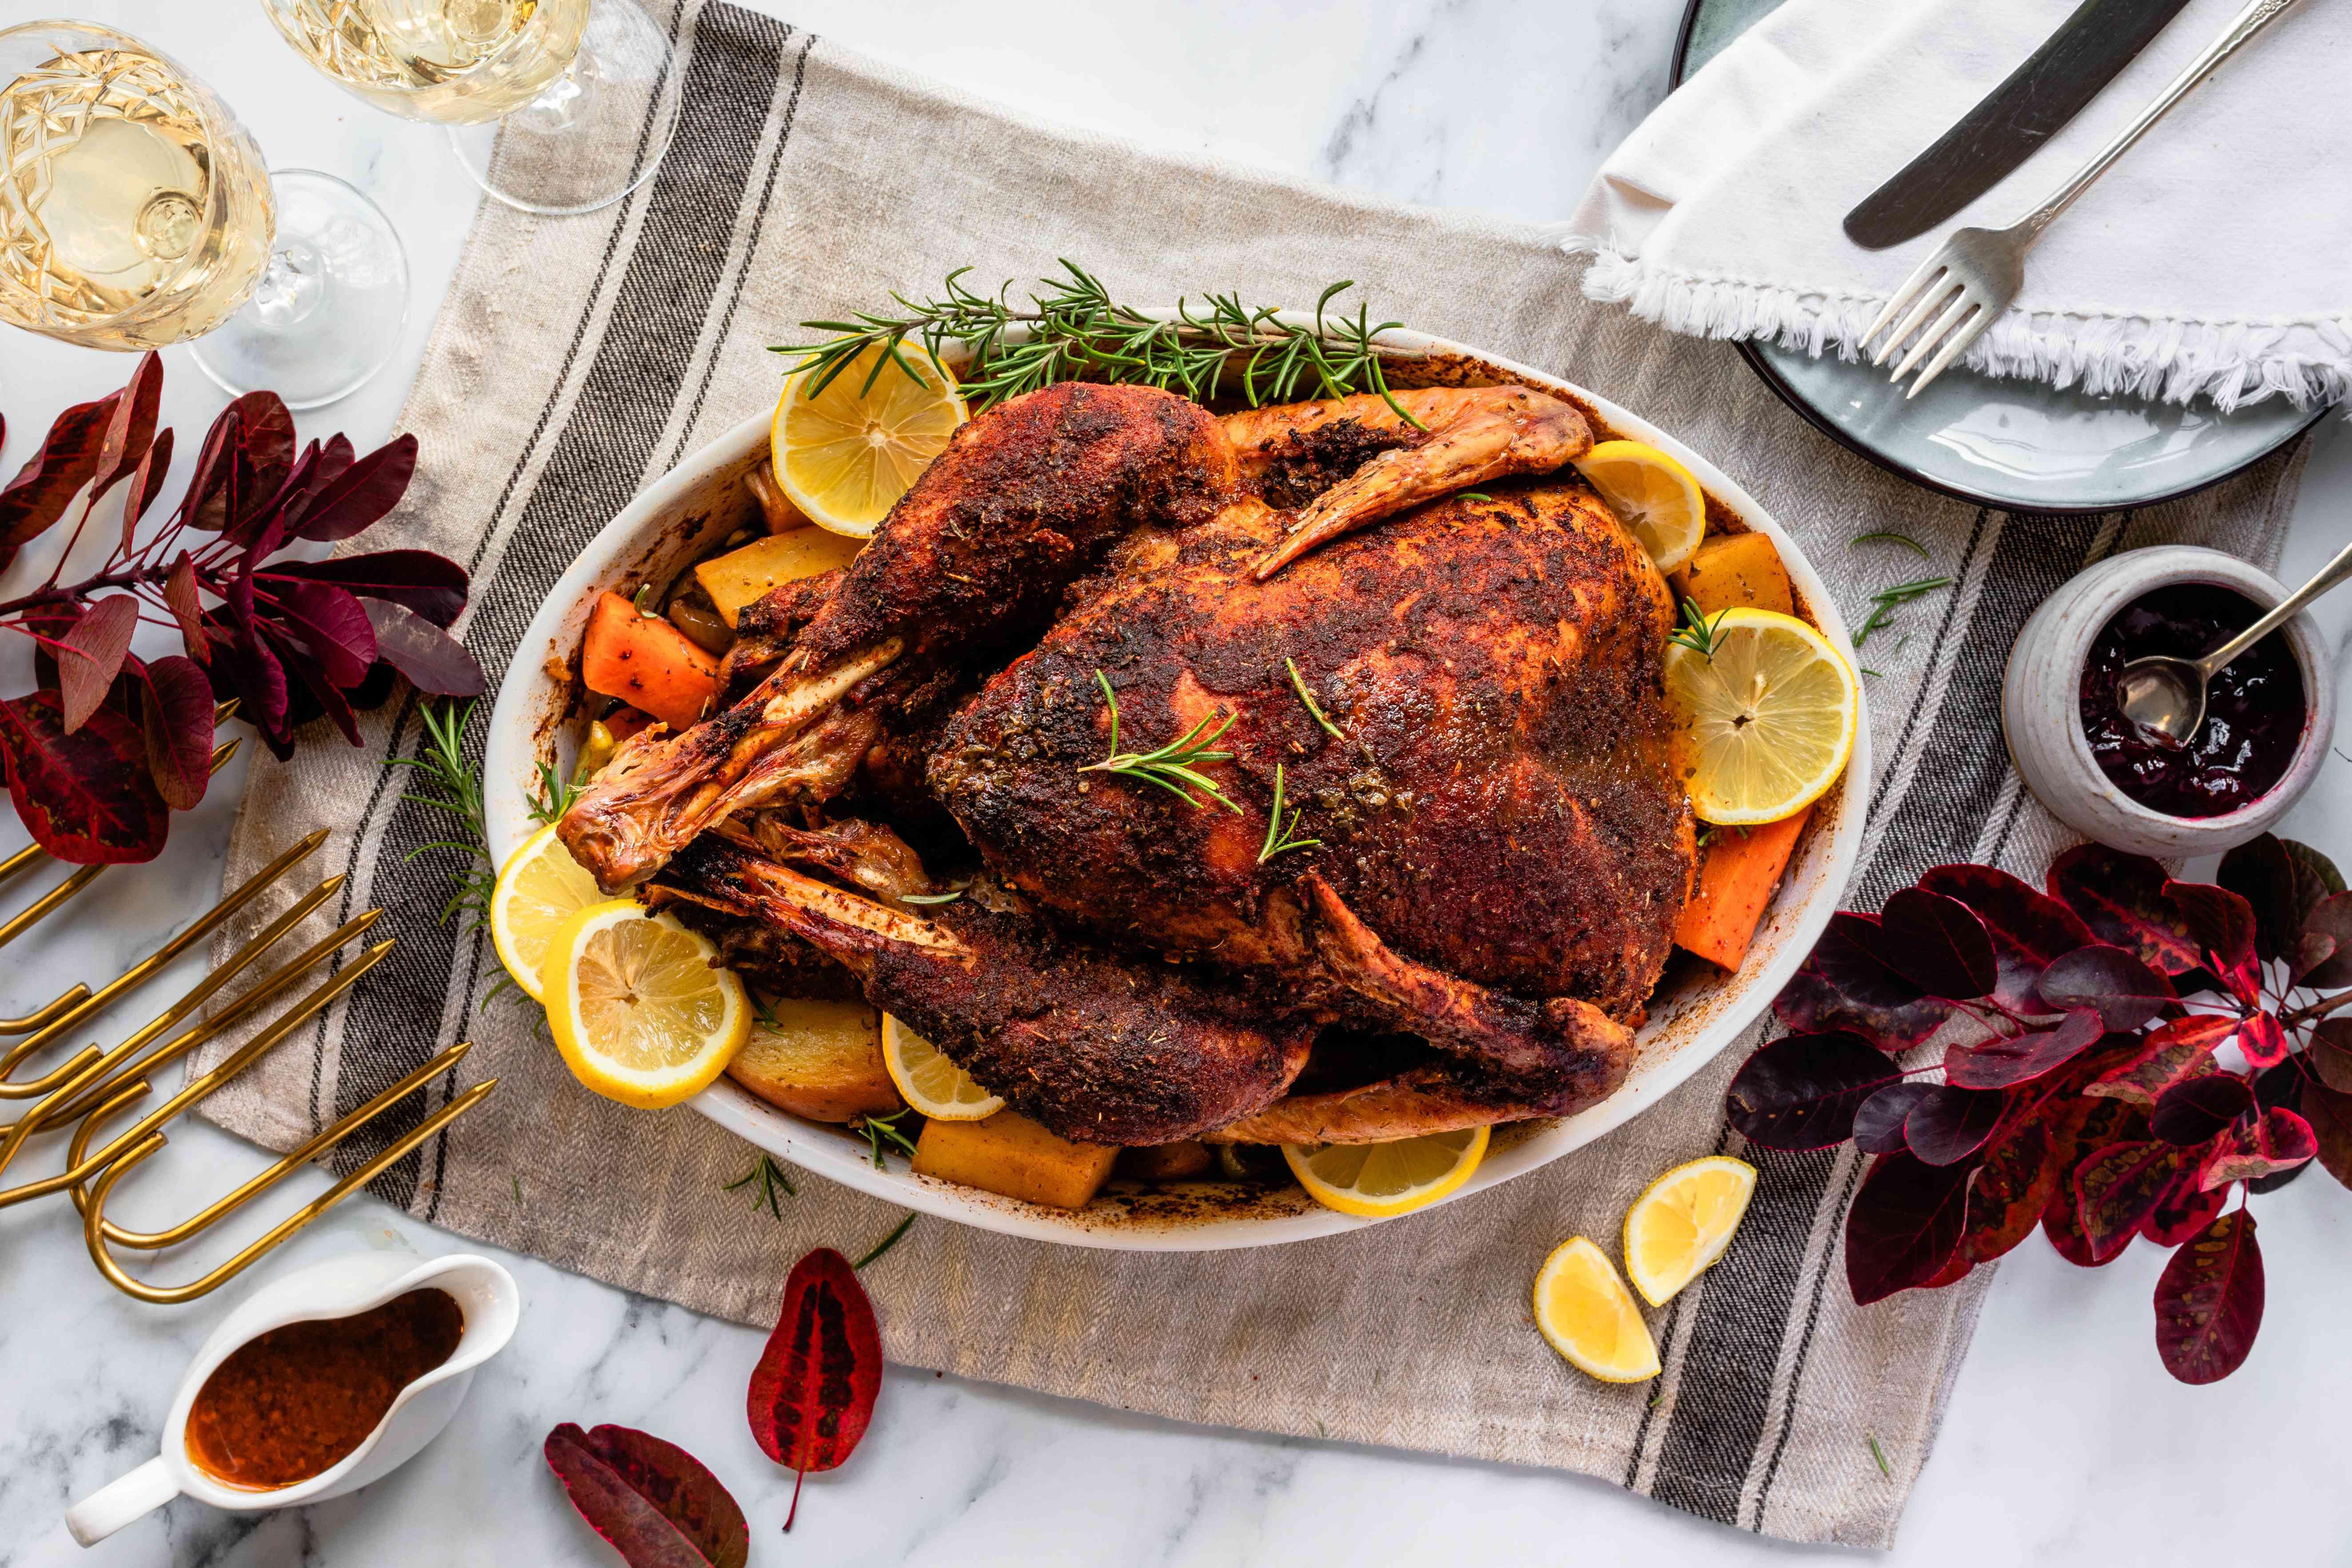 Serve turkey